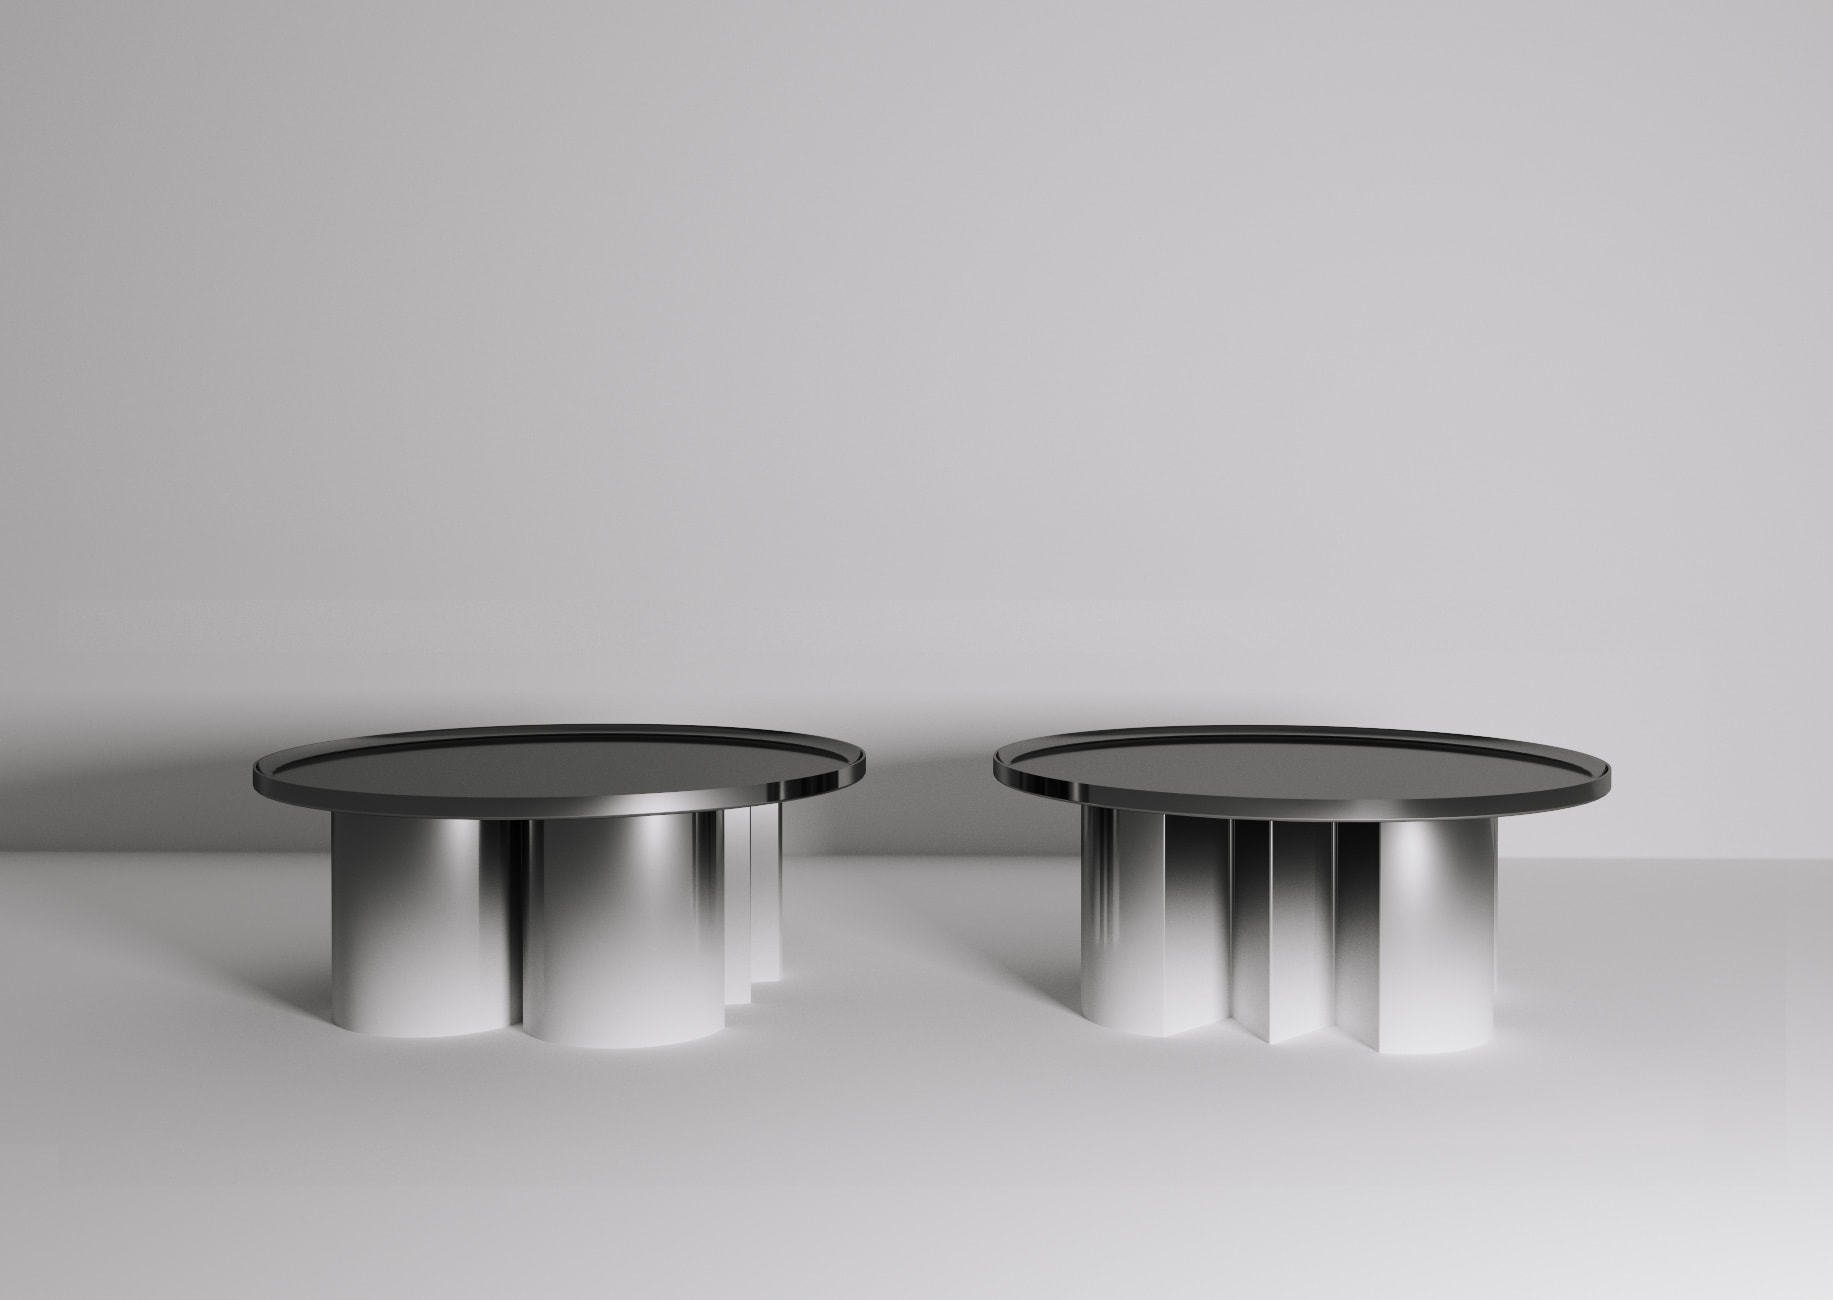 stella-object-furniture-coffee-table-objekt-nábytek-konferenční-stolek-design-jiri-krejcirik-